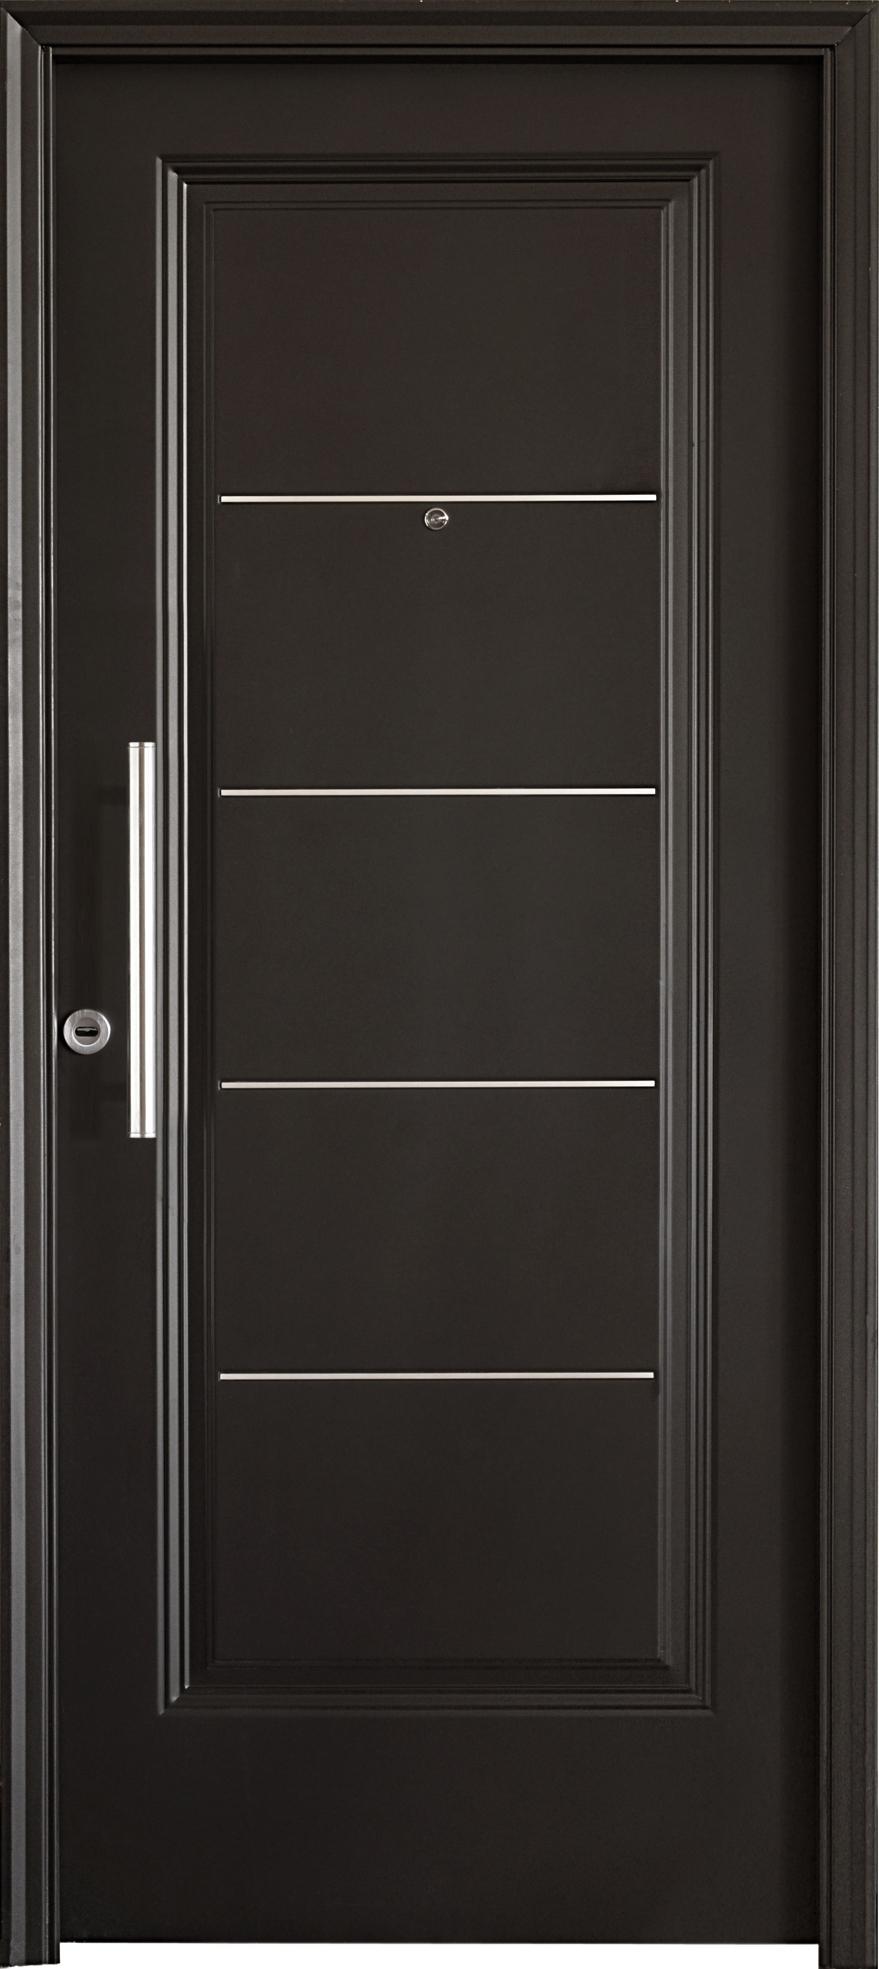 Aberturas mitre puertas de exterior chapa acero for Puertas de exterior